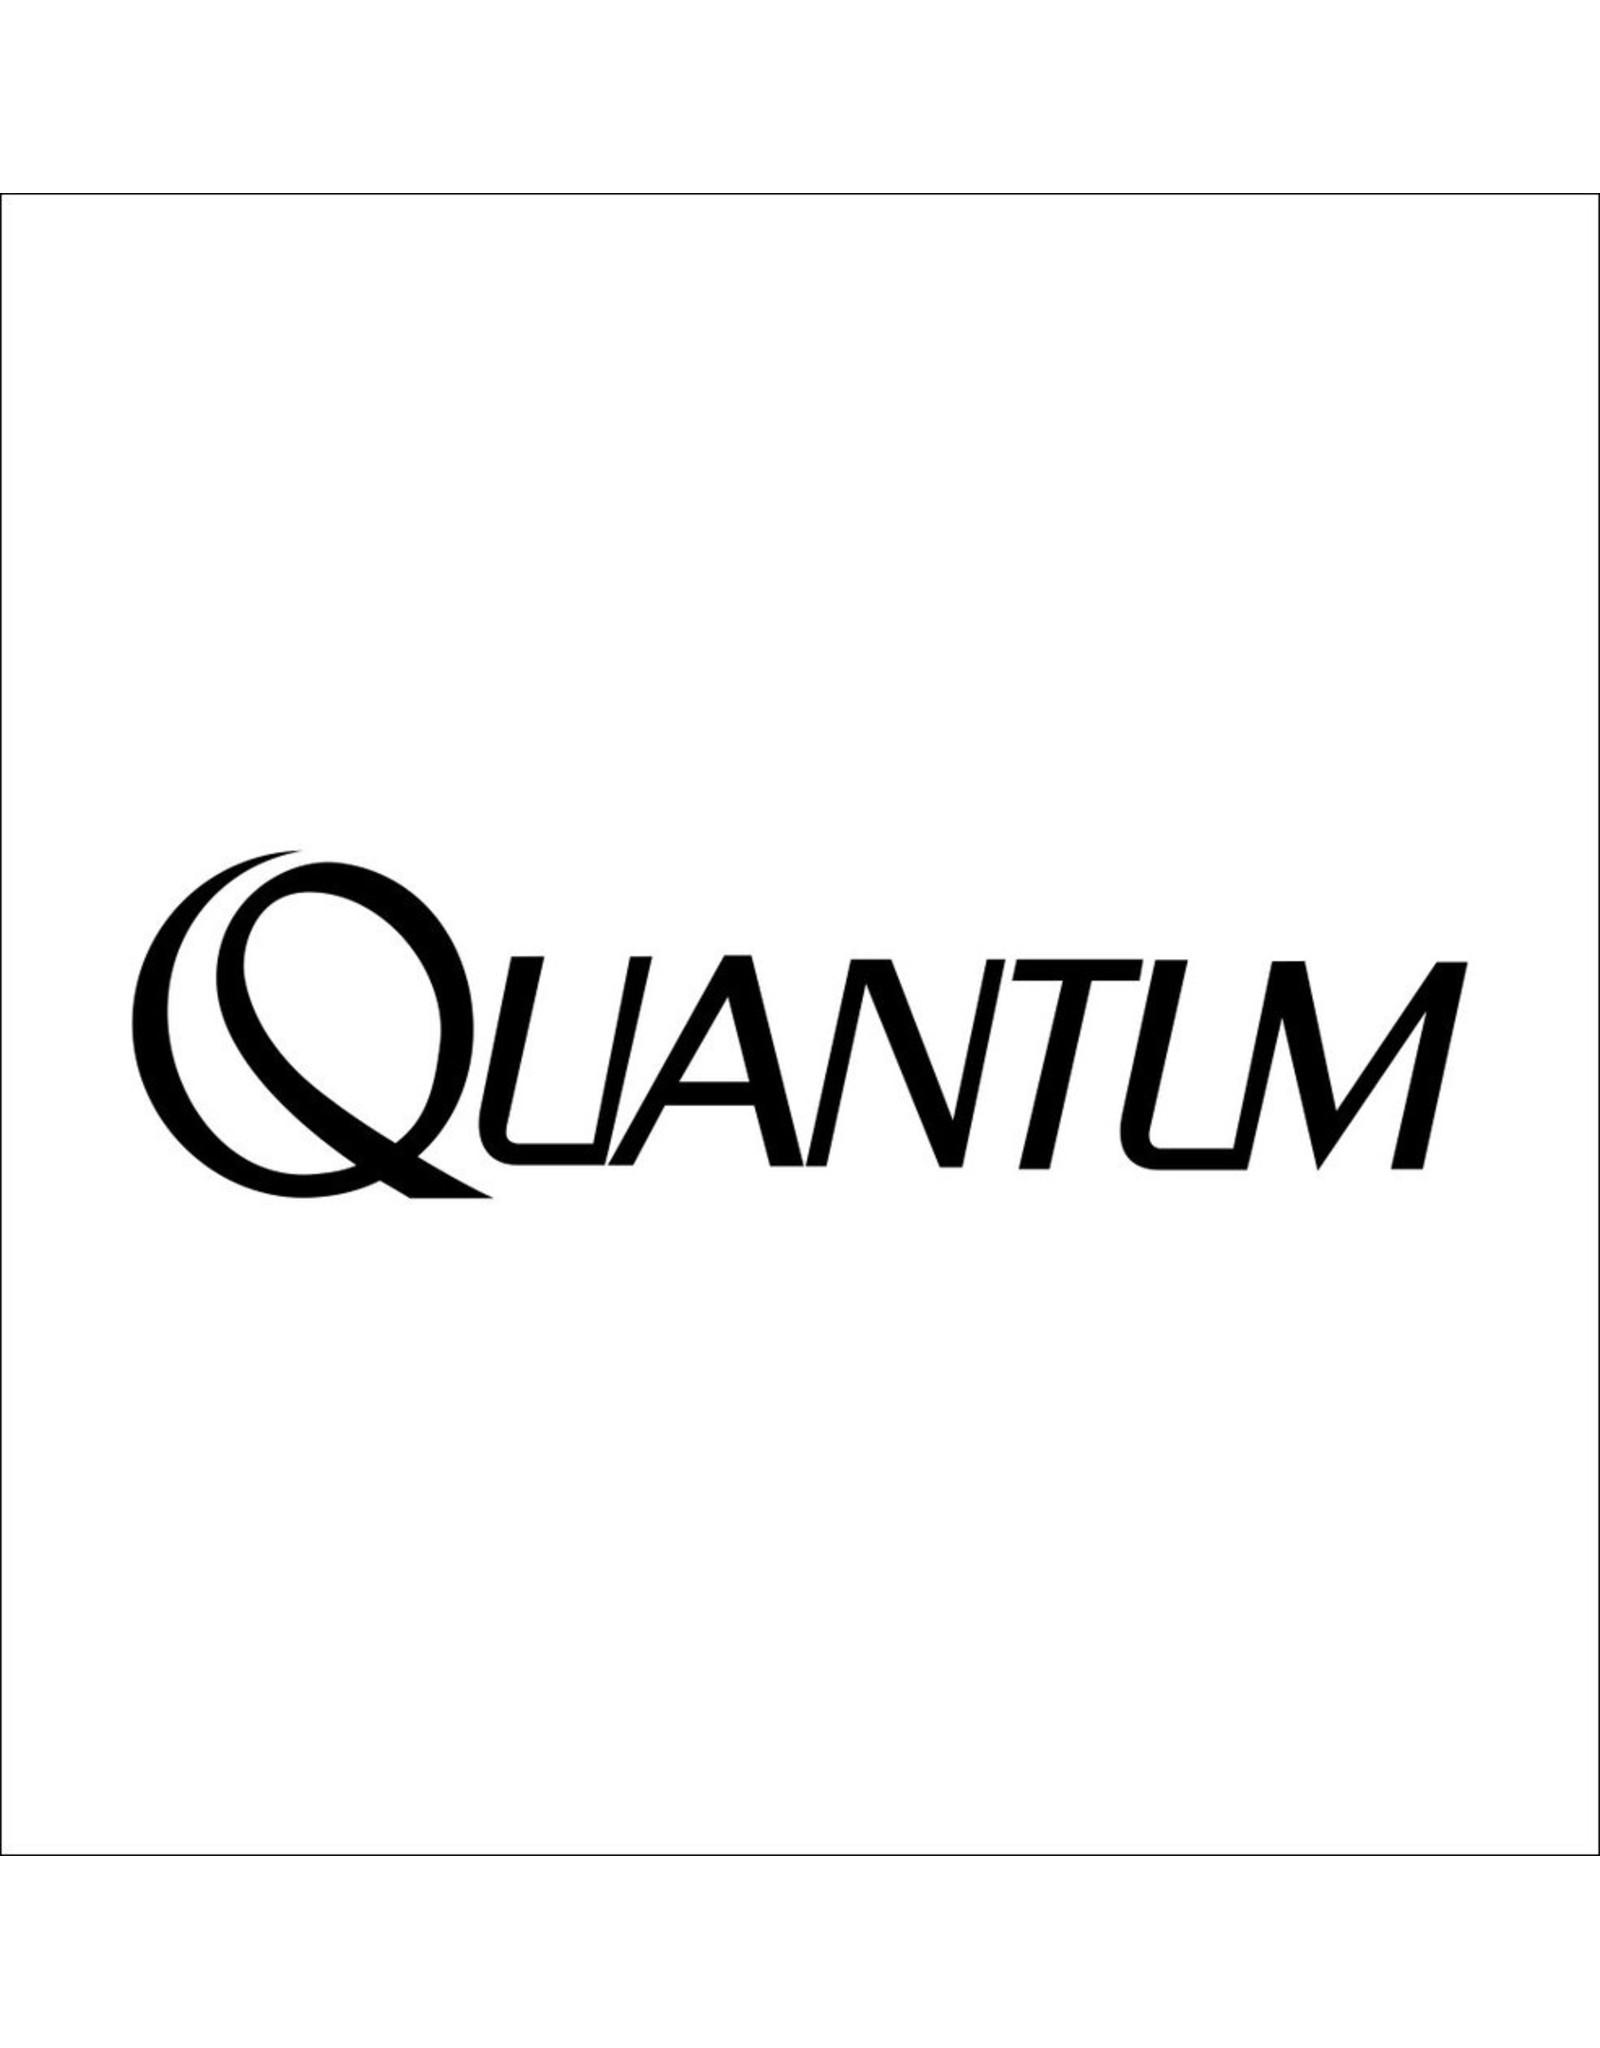 Quantum BODY ASSEMBLY